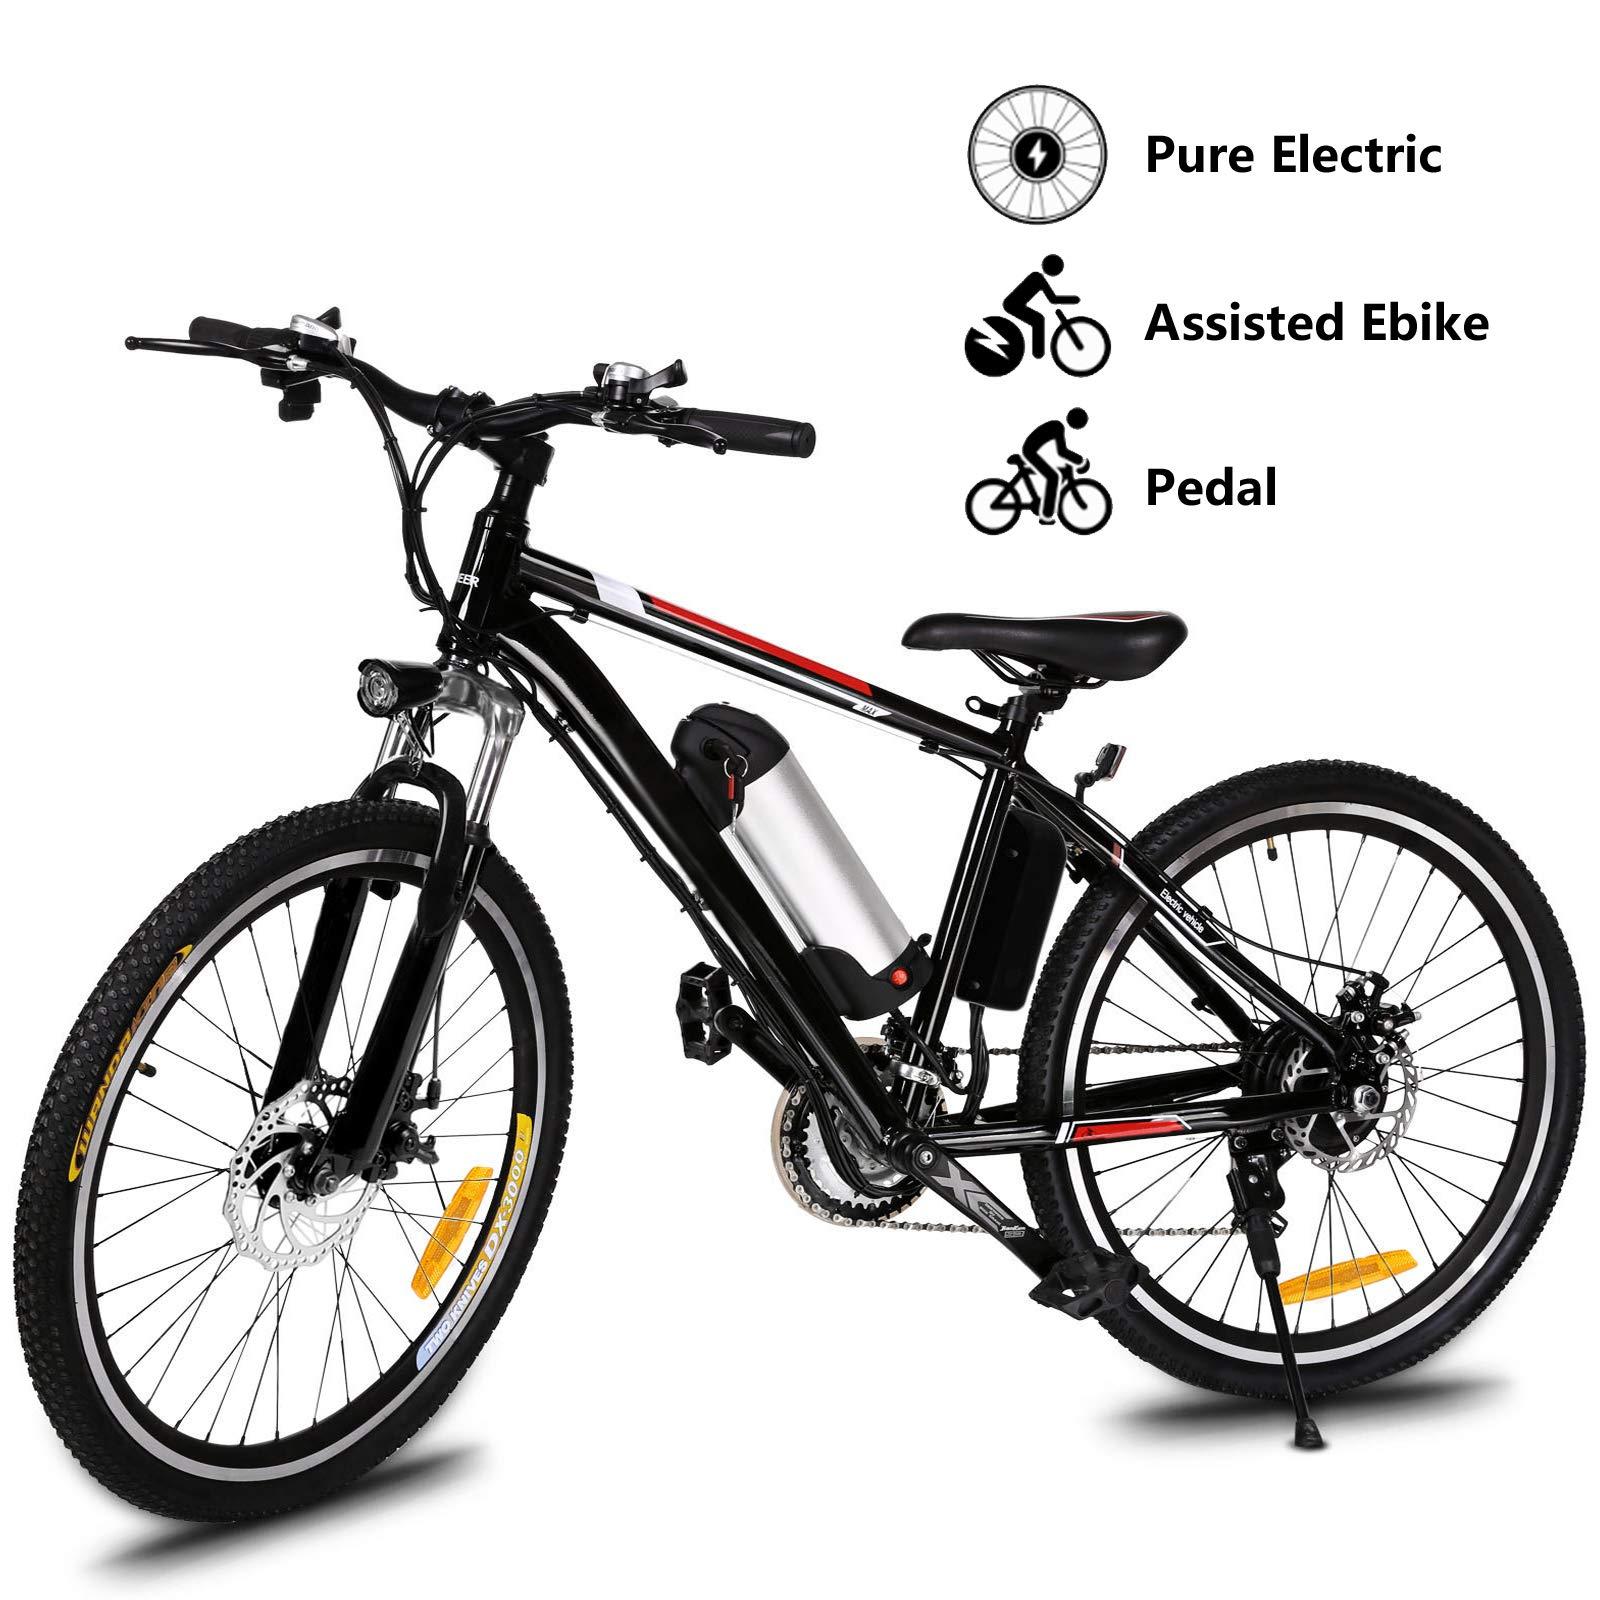 7c04c7d8e1b Yiilove Electric Mountain Bike 26'' Wheel Ebike 36V Lithium-Ion Battery,  Electric